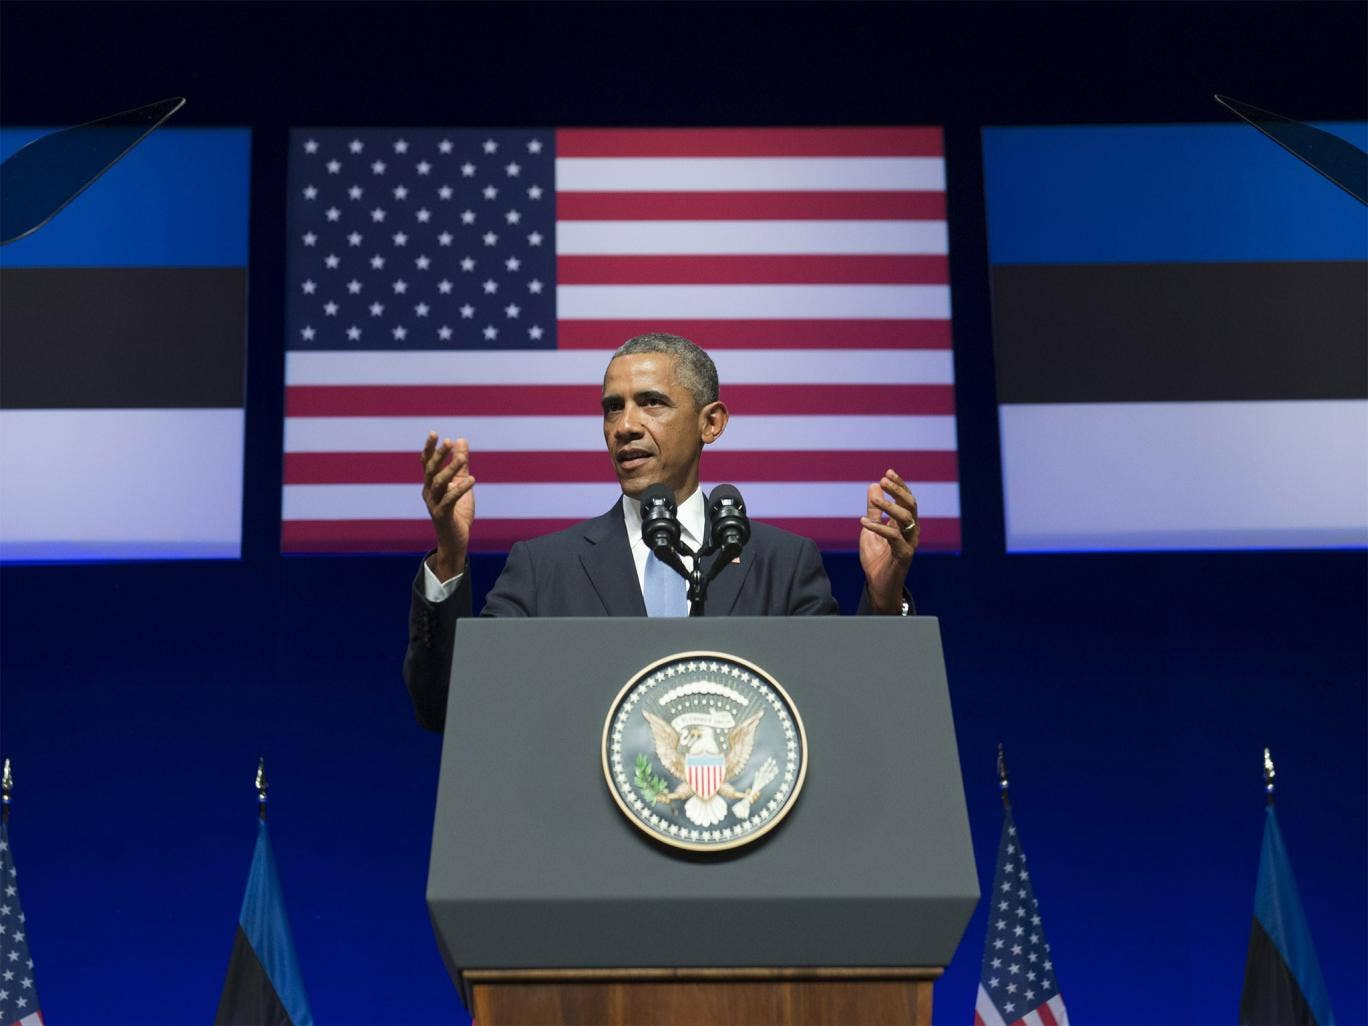 US President Barack Obama delivers a speech at Nordea Concert Hall in Tallinn, Estonia